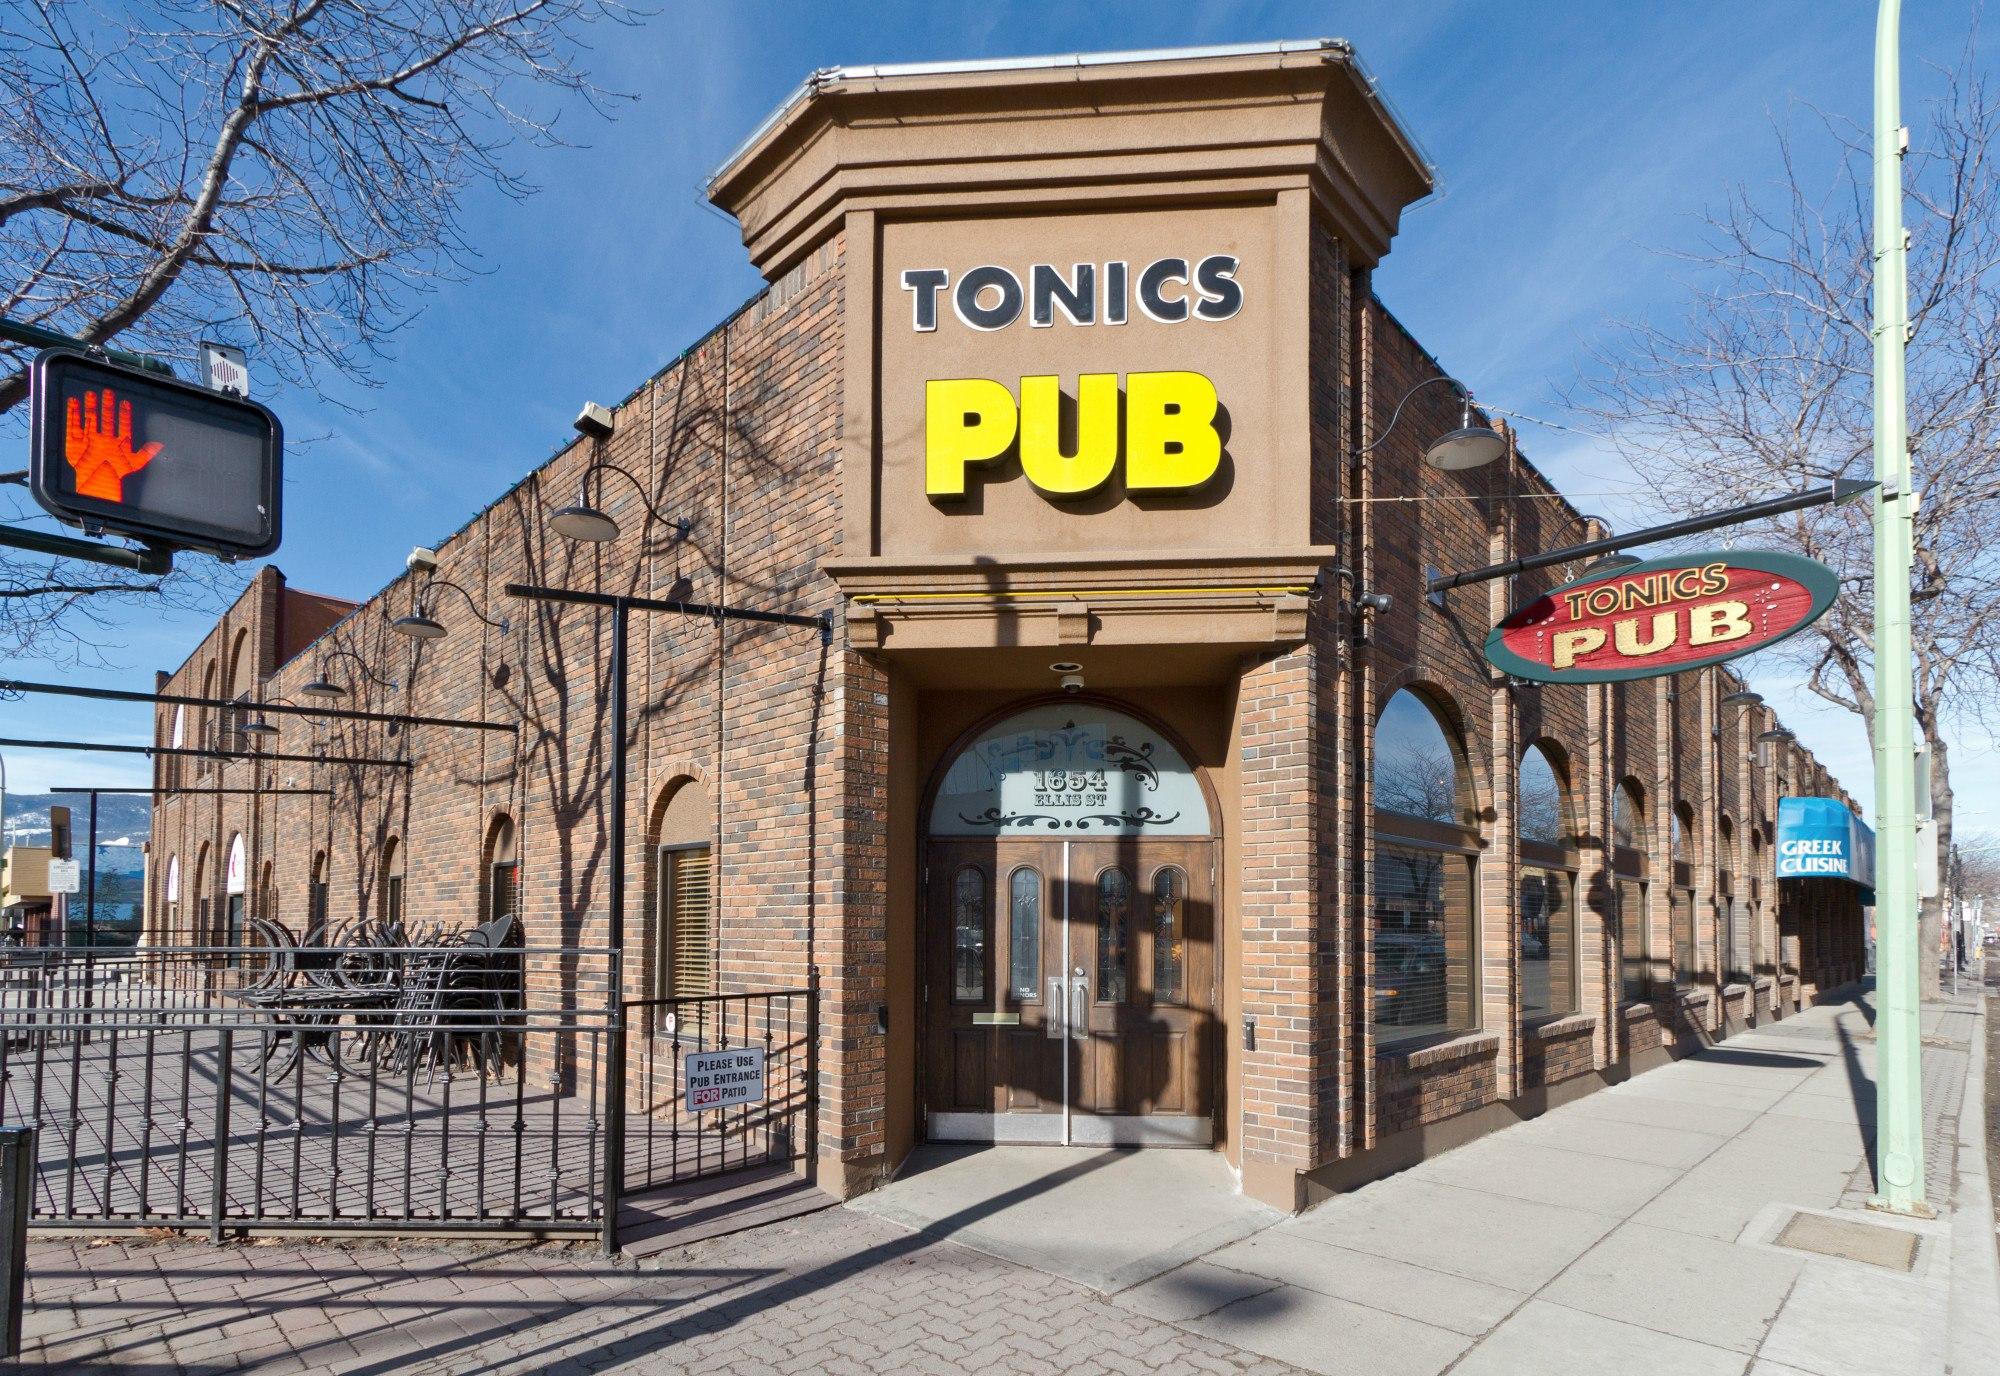 Tonics Pub